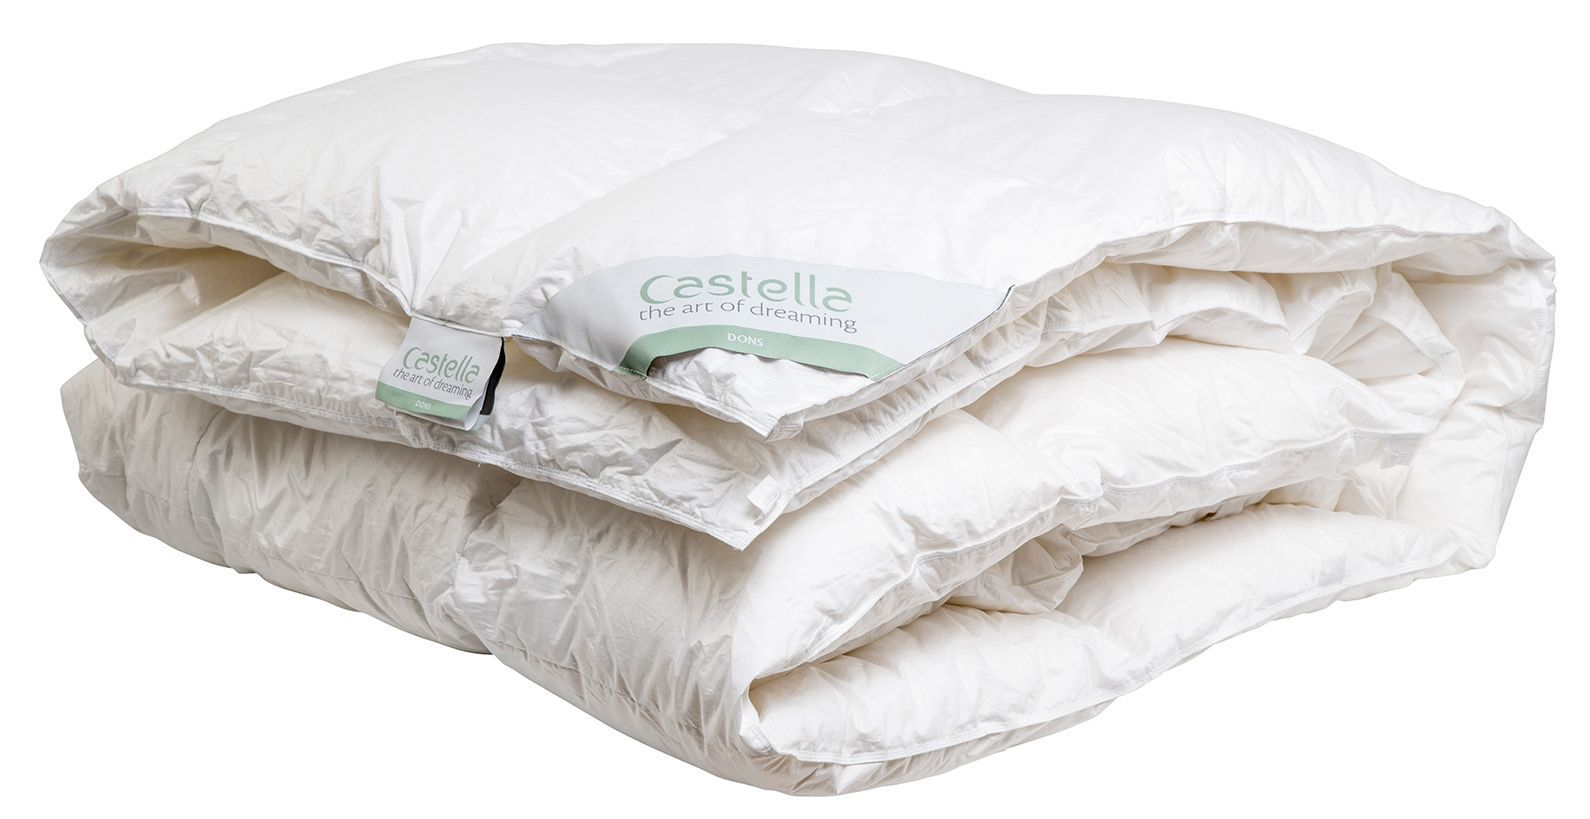 Castella Wega Lente/Herfst Dekbed Dons